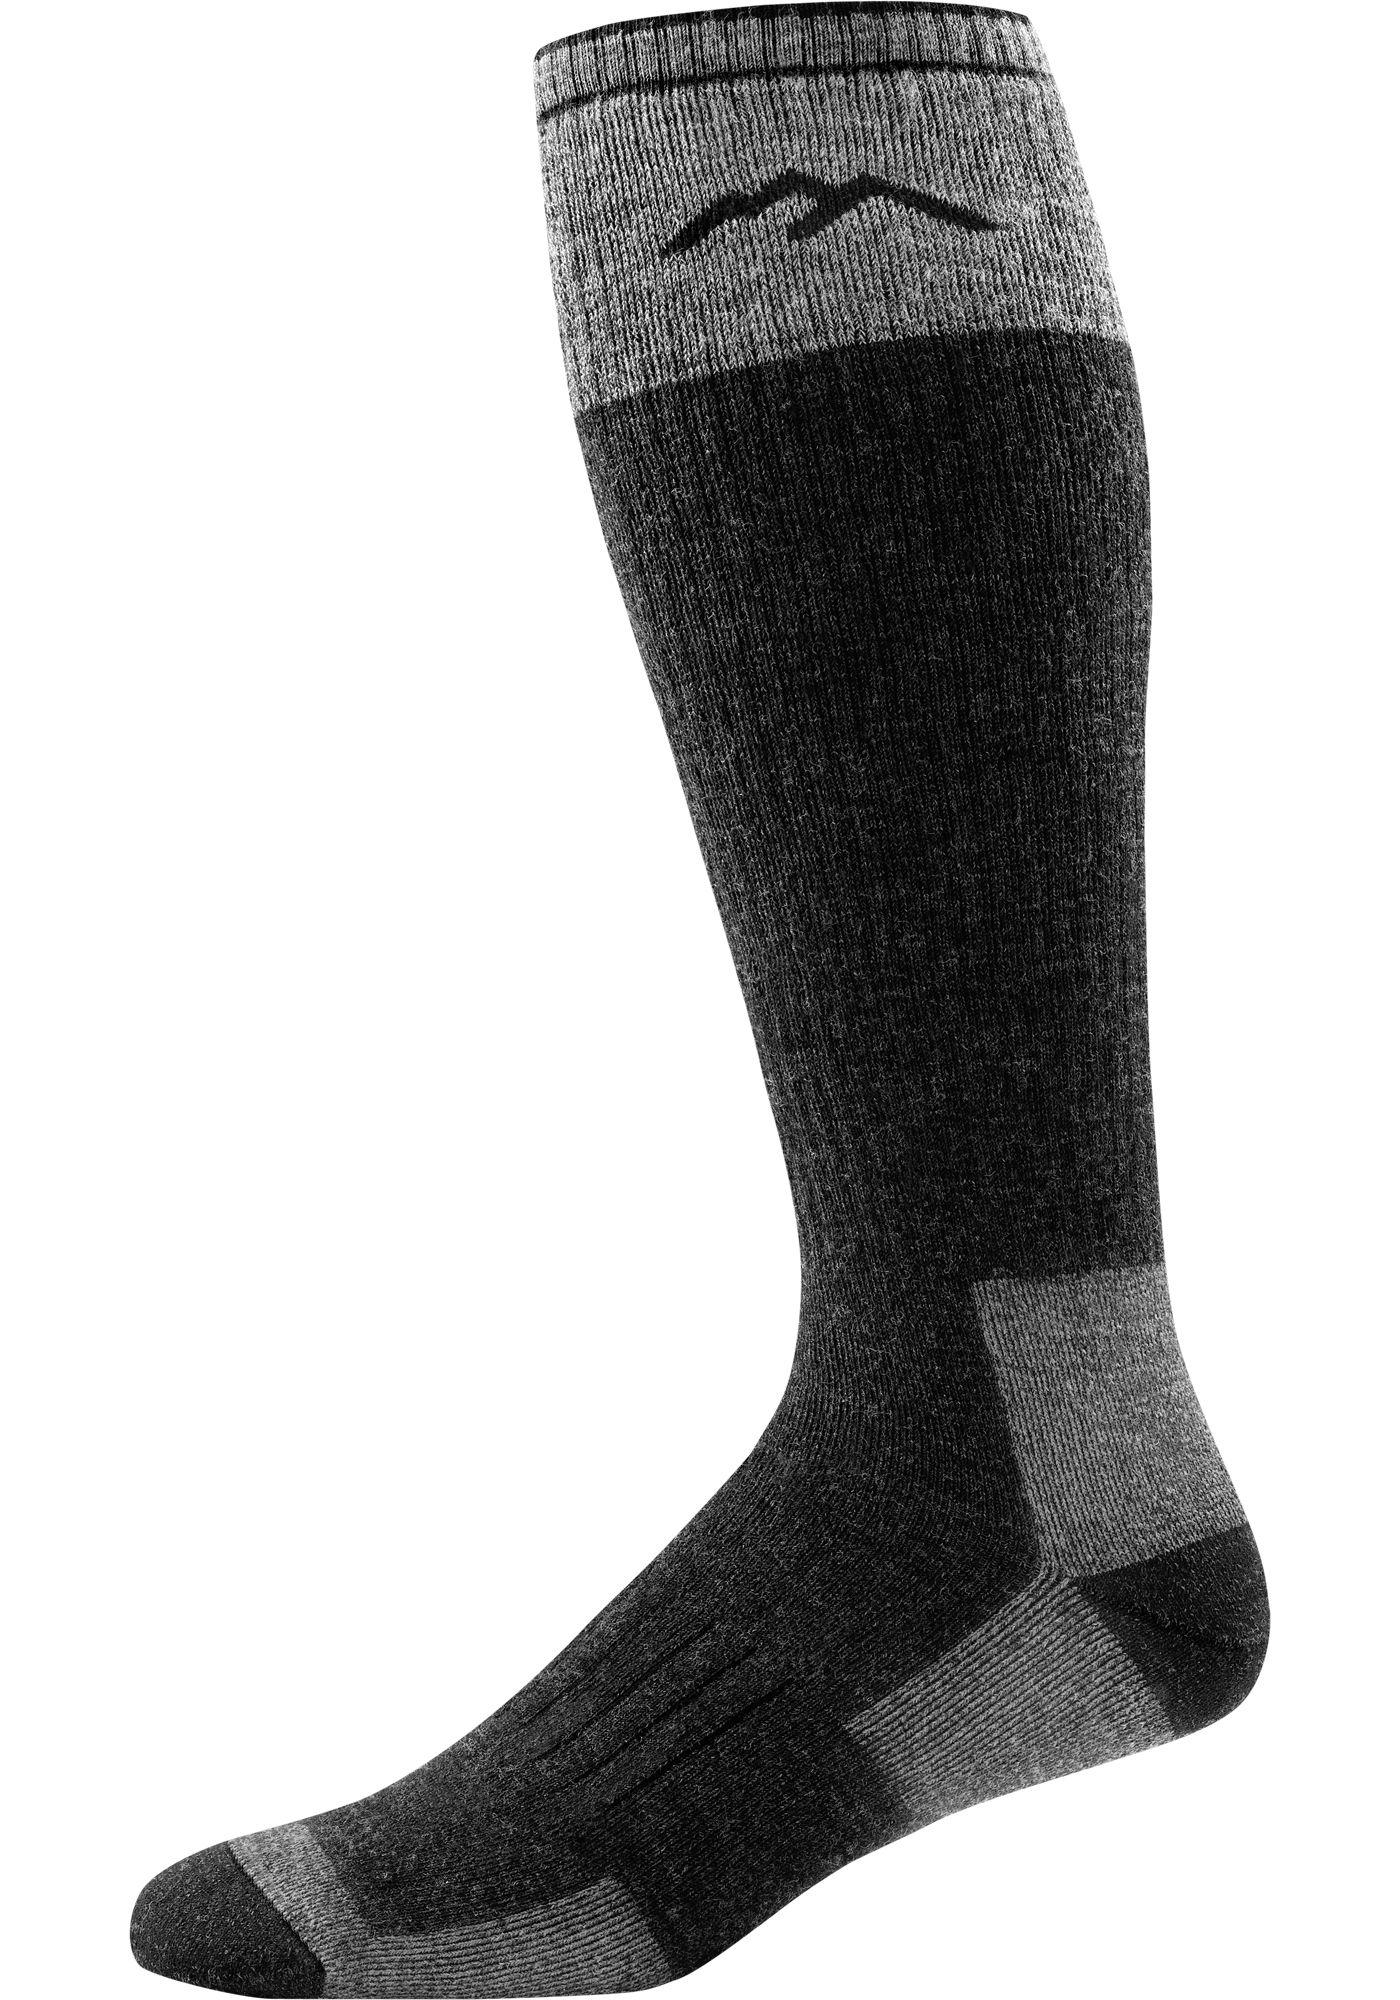 Darn Tough Men's Hunter Over-the-Calf Extra Cushion Socks